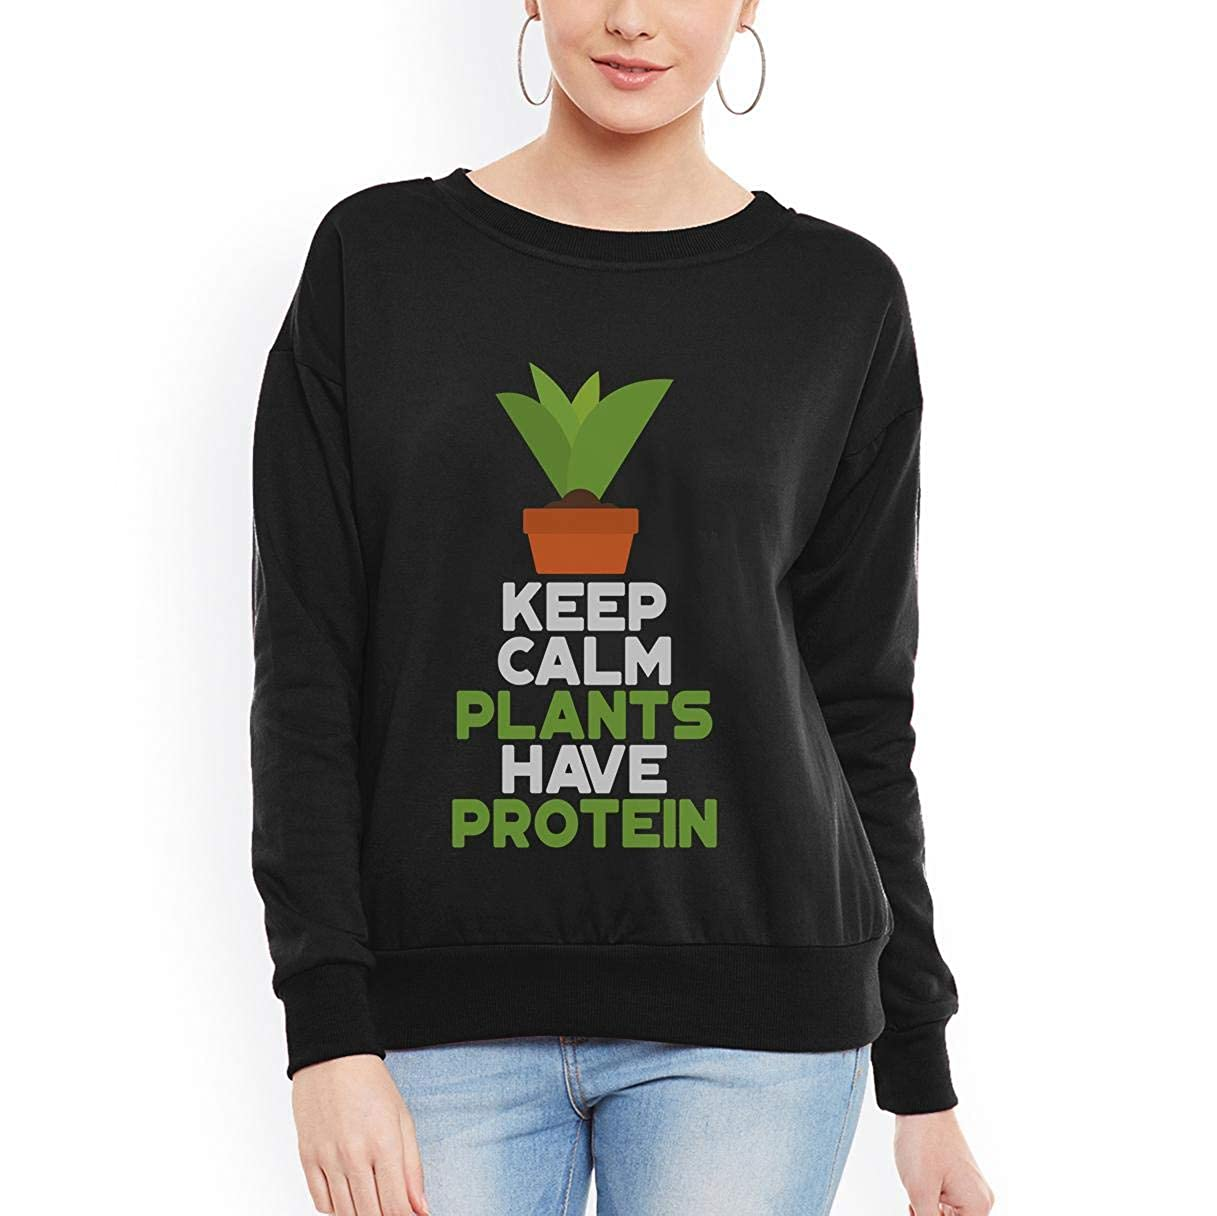 tee Doryti Keep Calm Plants Have Protein Funny Vegan Vegetarian Women Sweatshirt